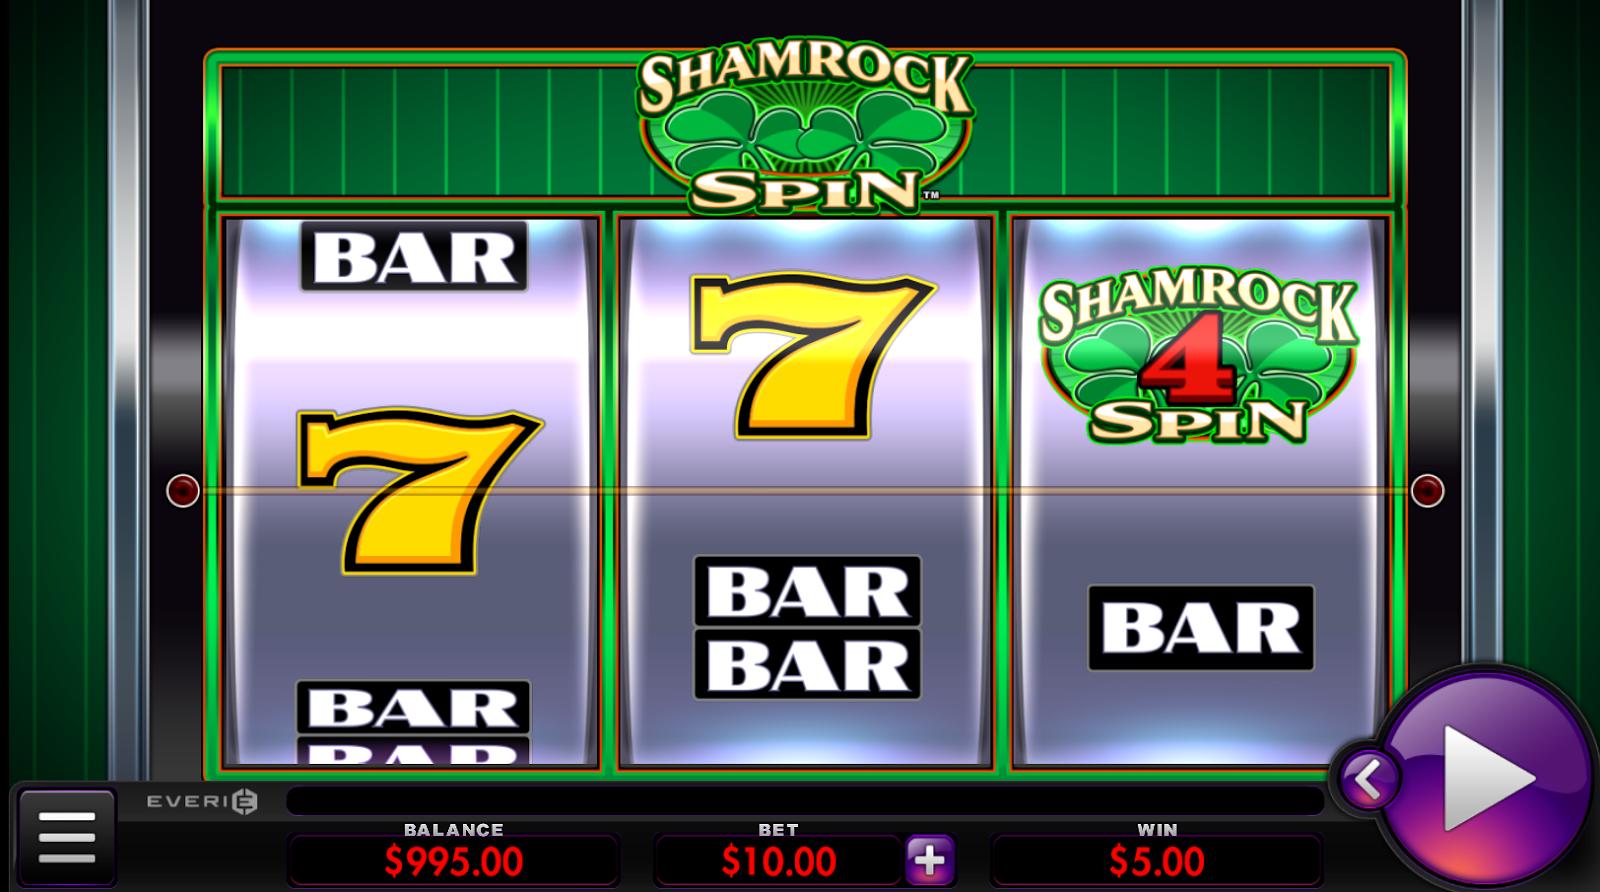 Shamrock Spin